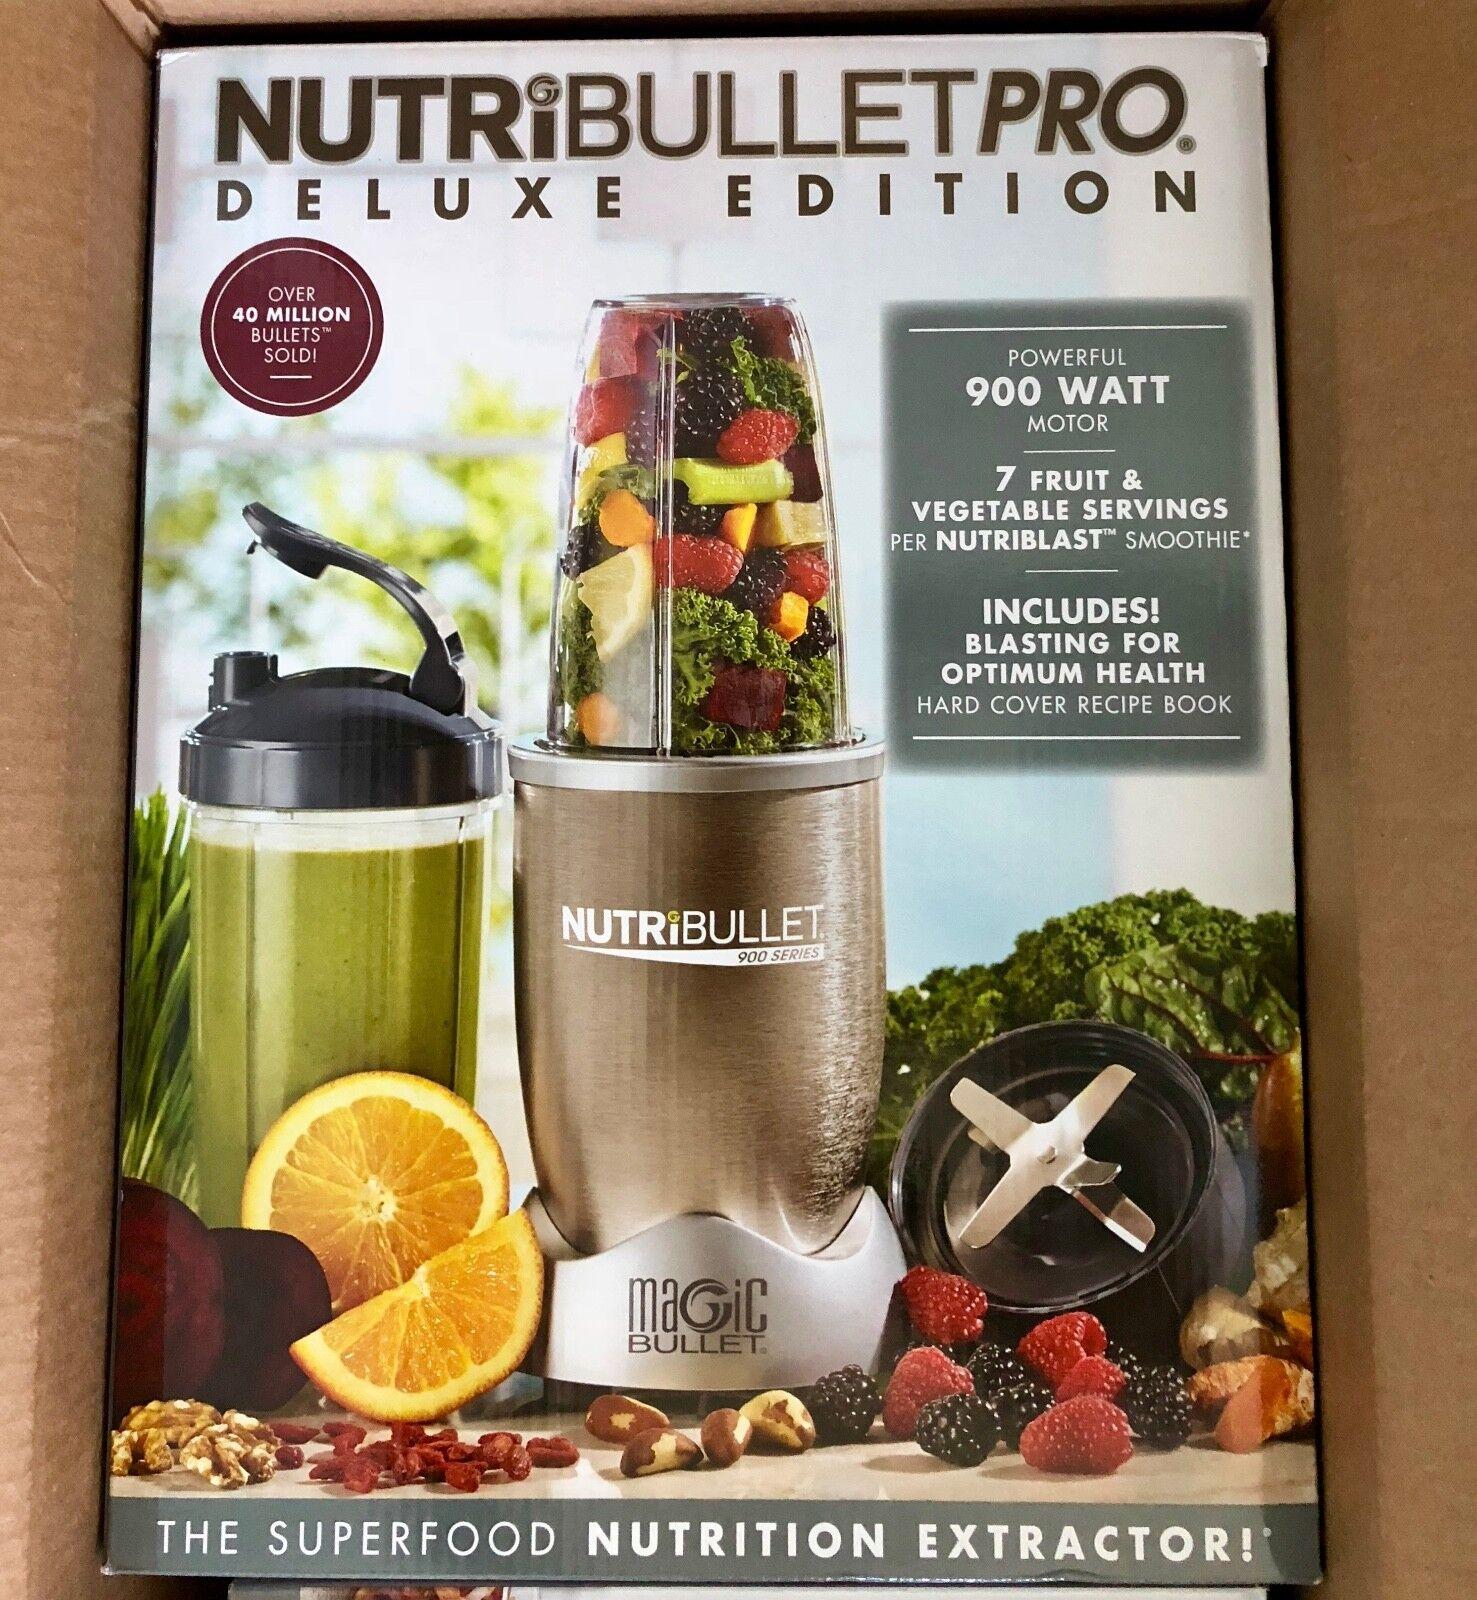 NutriBullet Pro 900 Watt Stainless Steel 13 Piece Nutrition Blender & Recipes